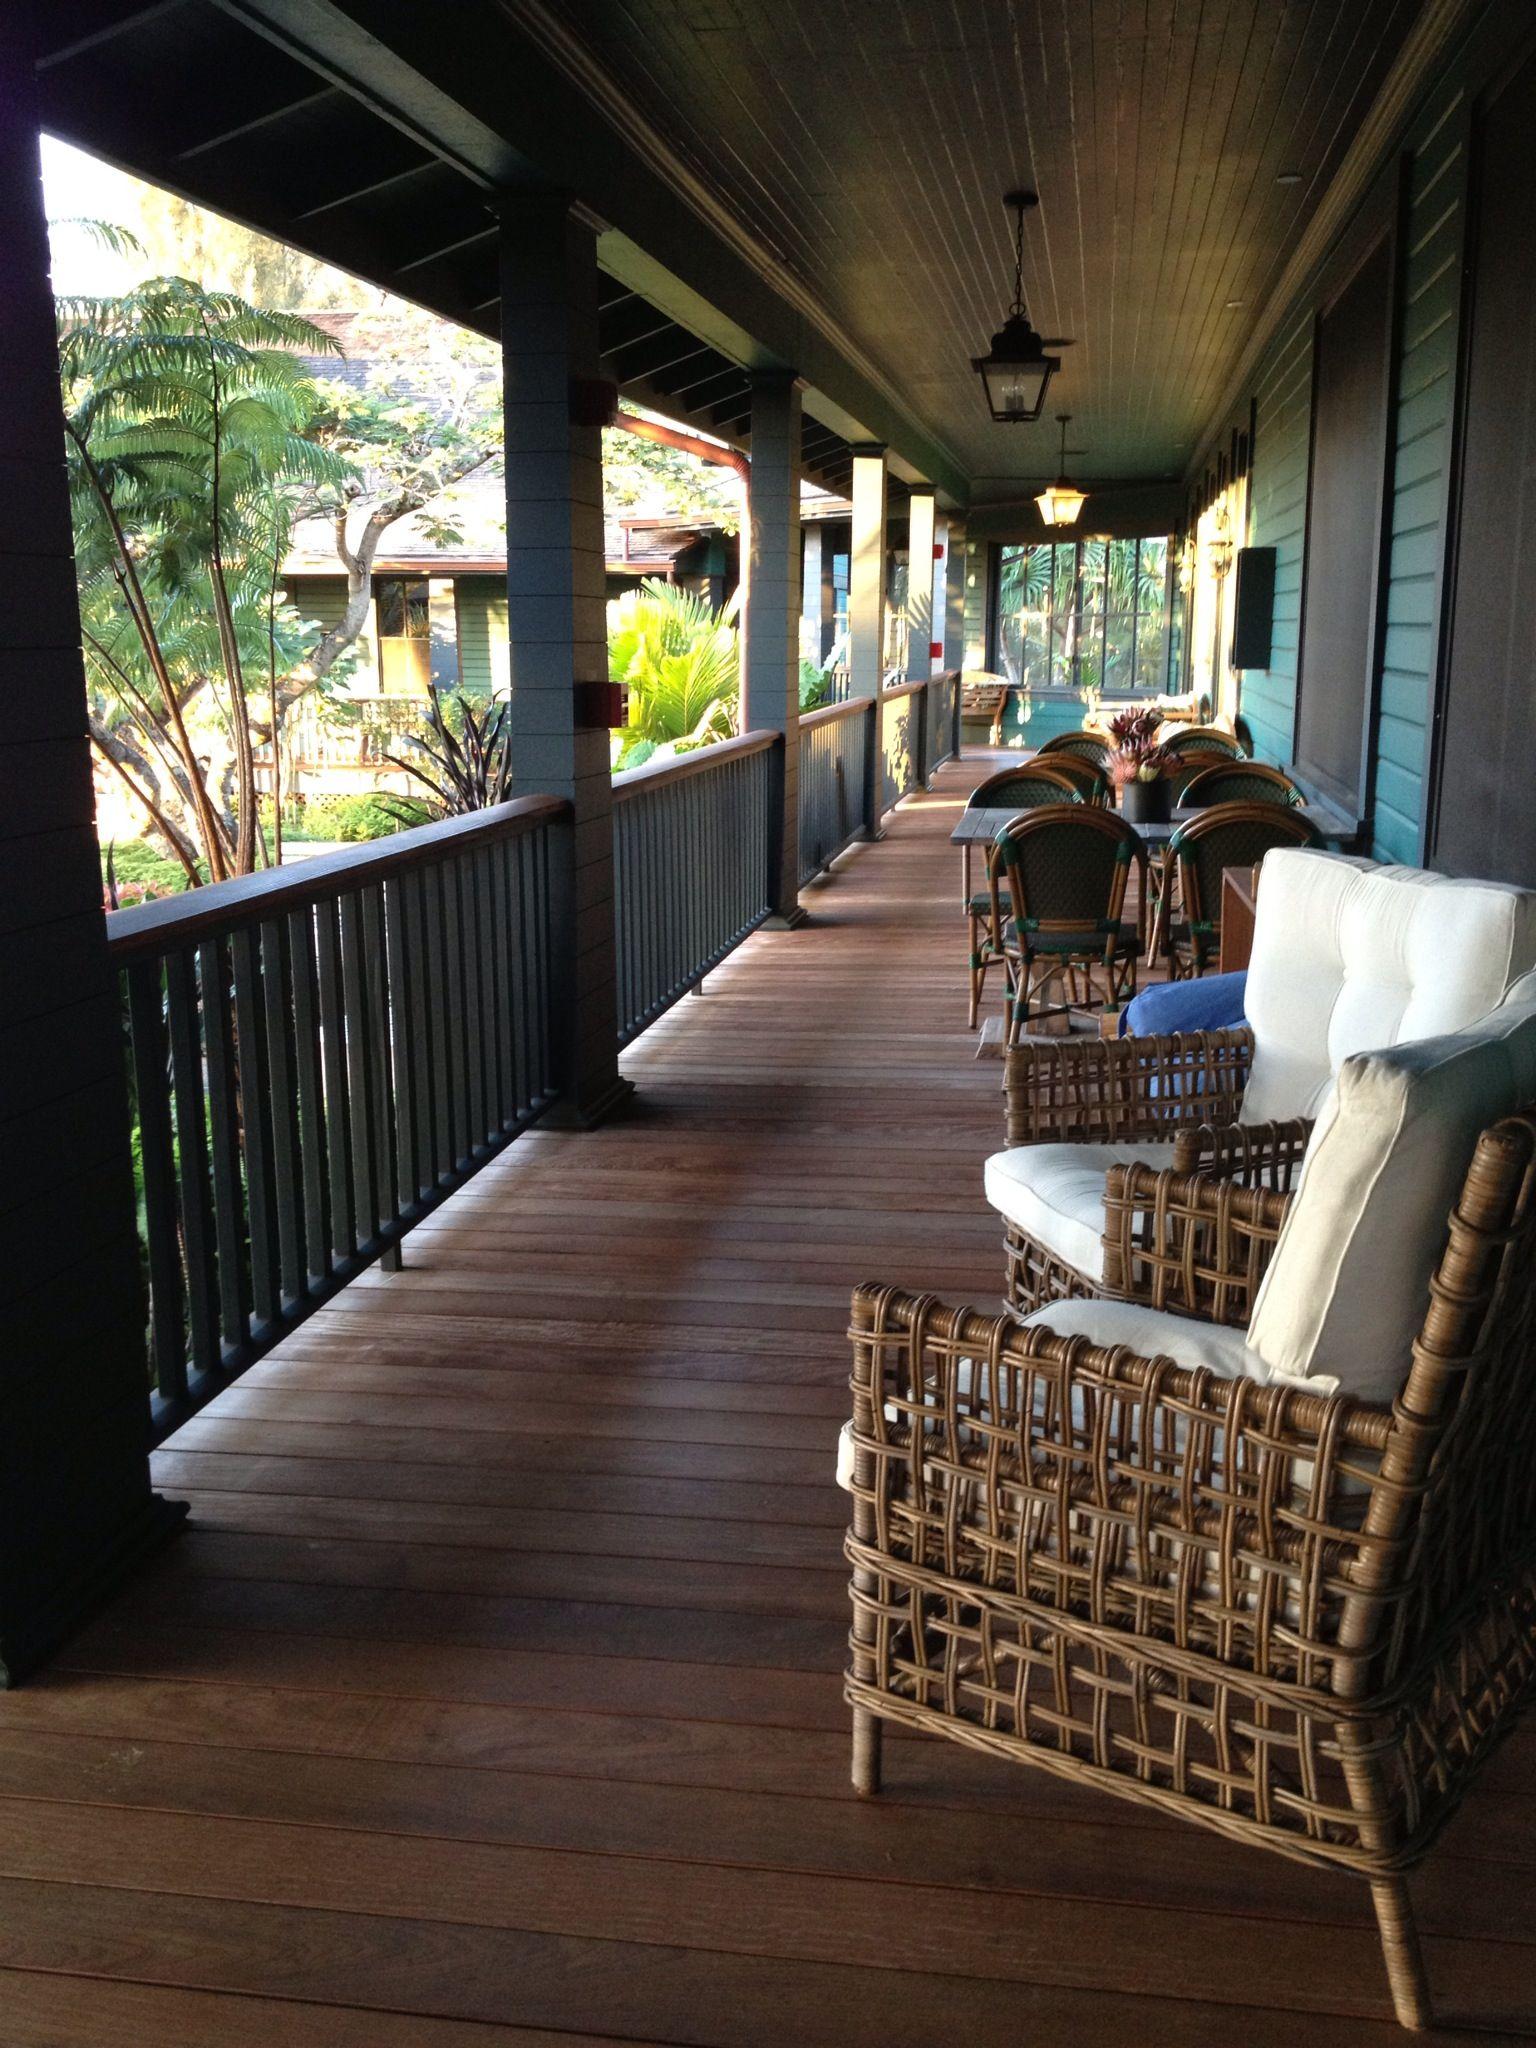 Zen porch